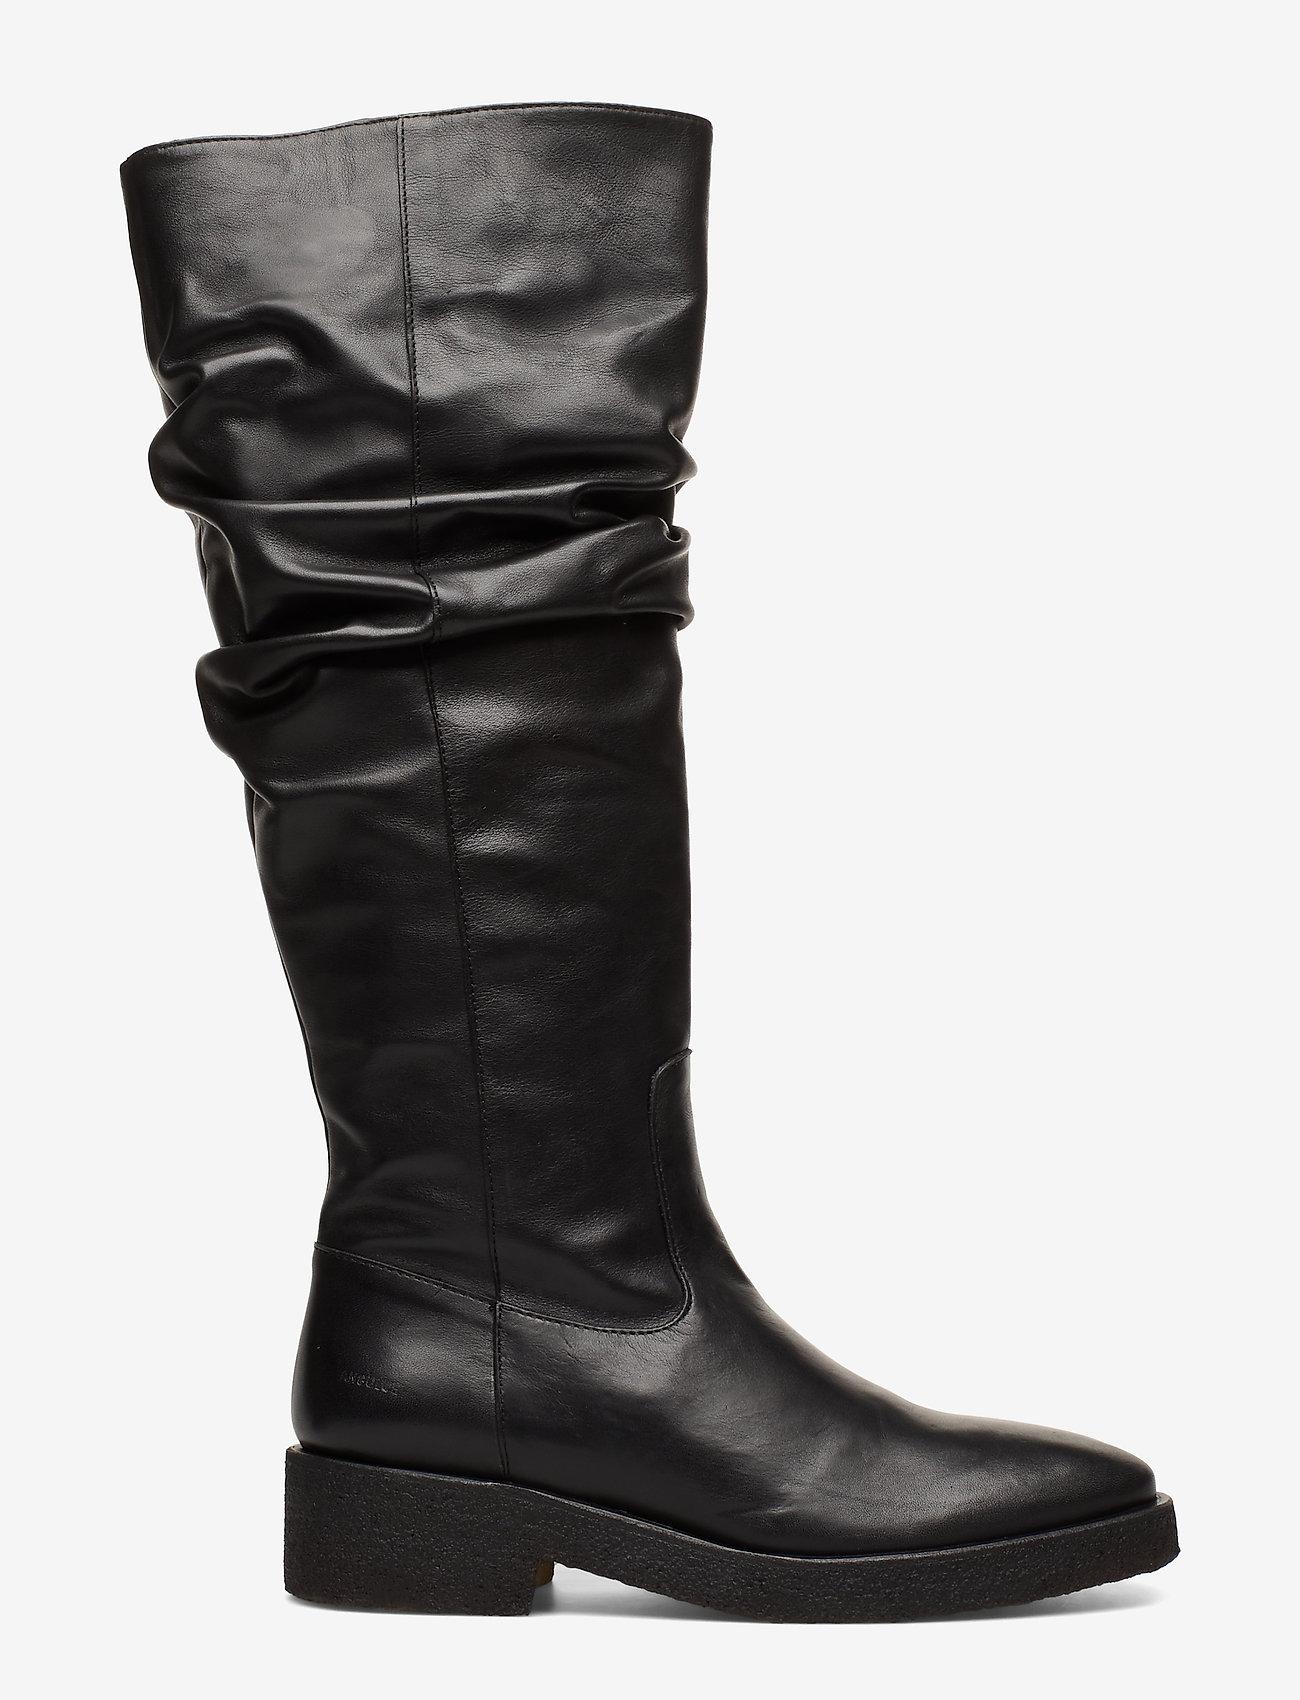 ANGULUS - Booties - flat - with zipper - bottes hautes - 1604 black - 1